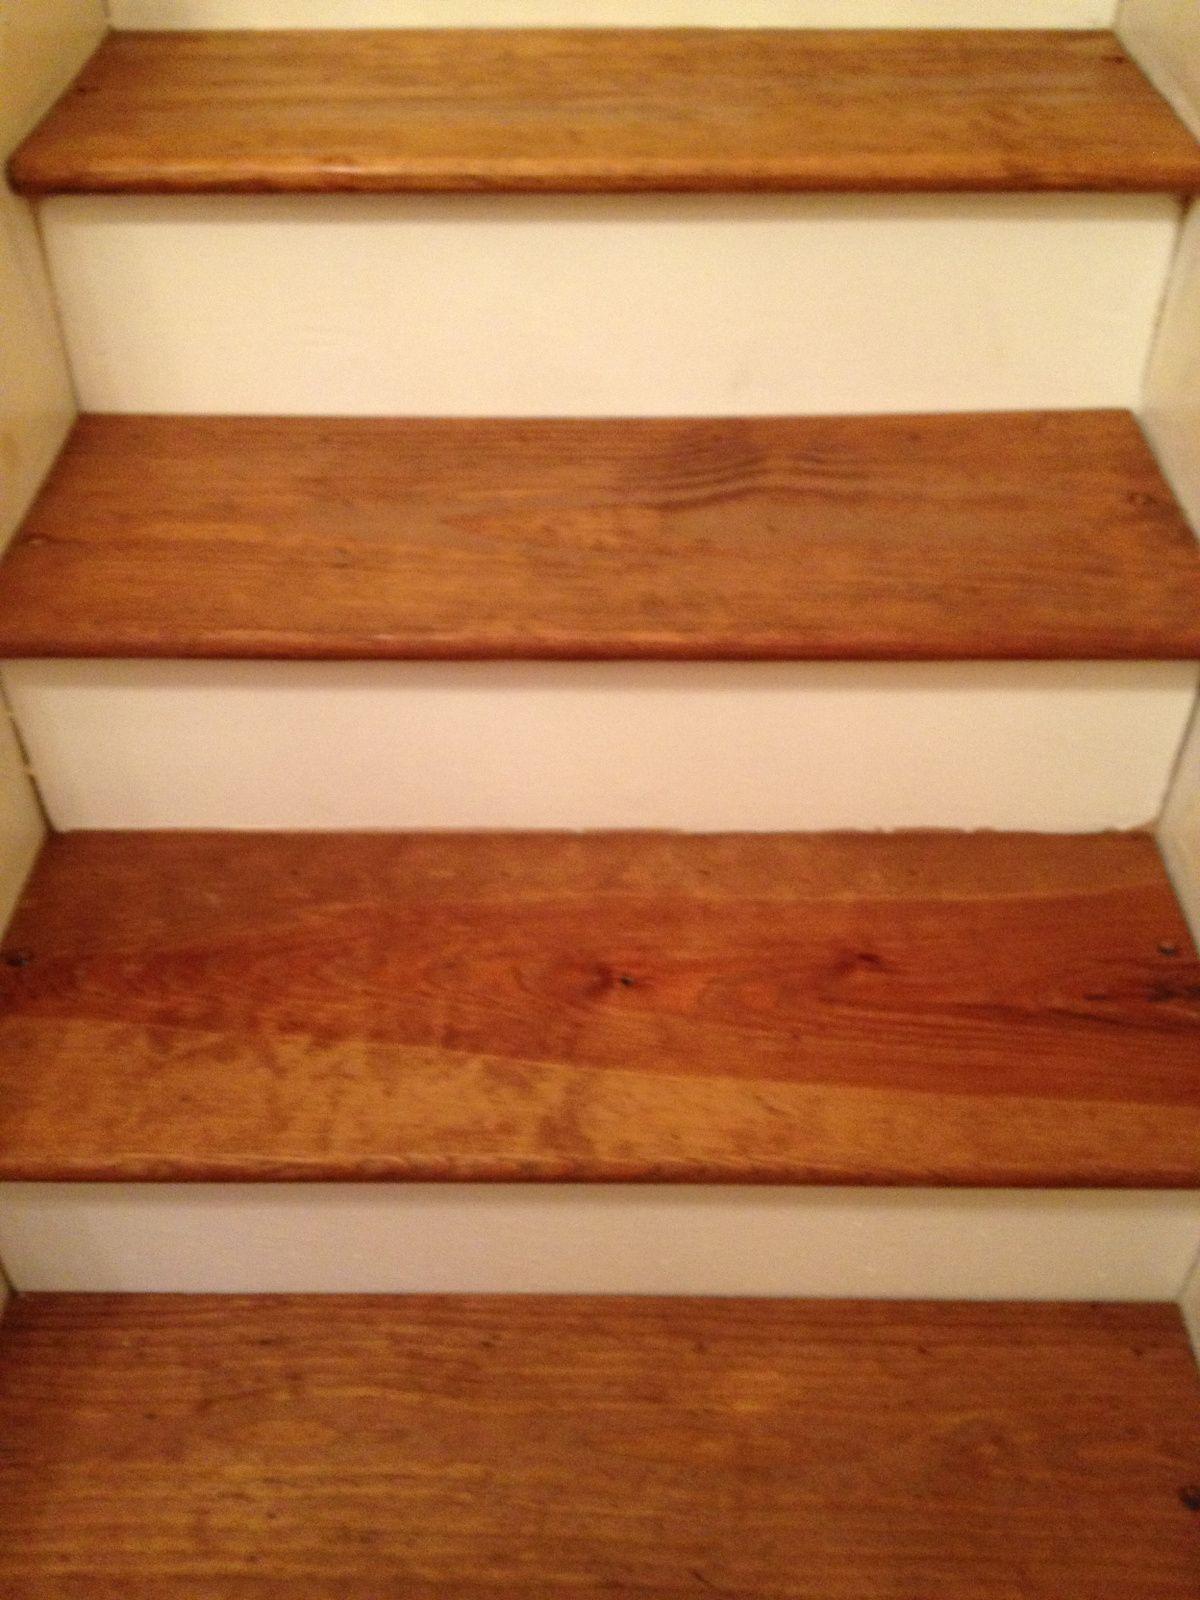 Diy Pine Stair Treads Remodel Pine Stair Treads Stair Treads   Oak Stair Tread Caps   Scraped Oak   Red Oak   Vinyl Plank Flooring   Pergo Outlast   Sp125 4F048C